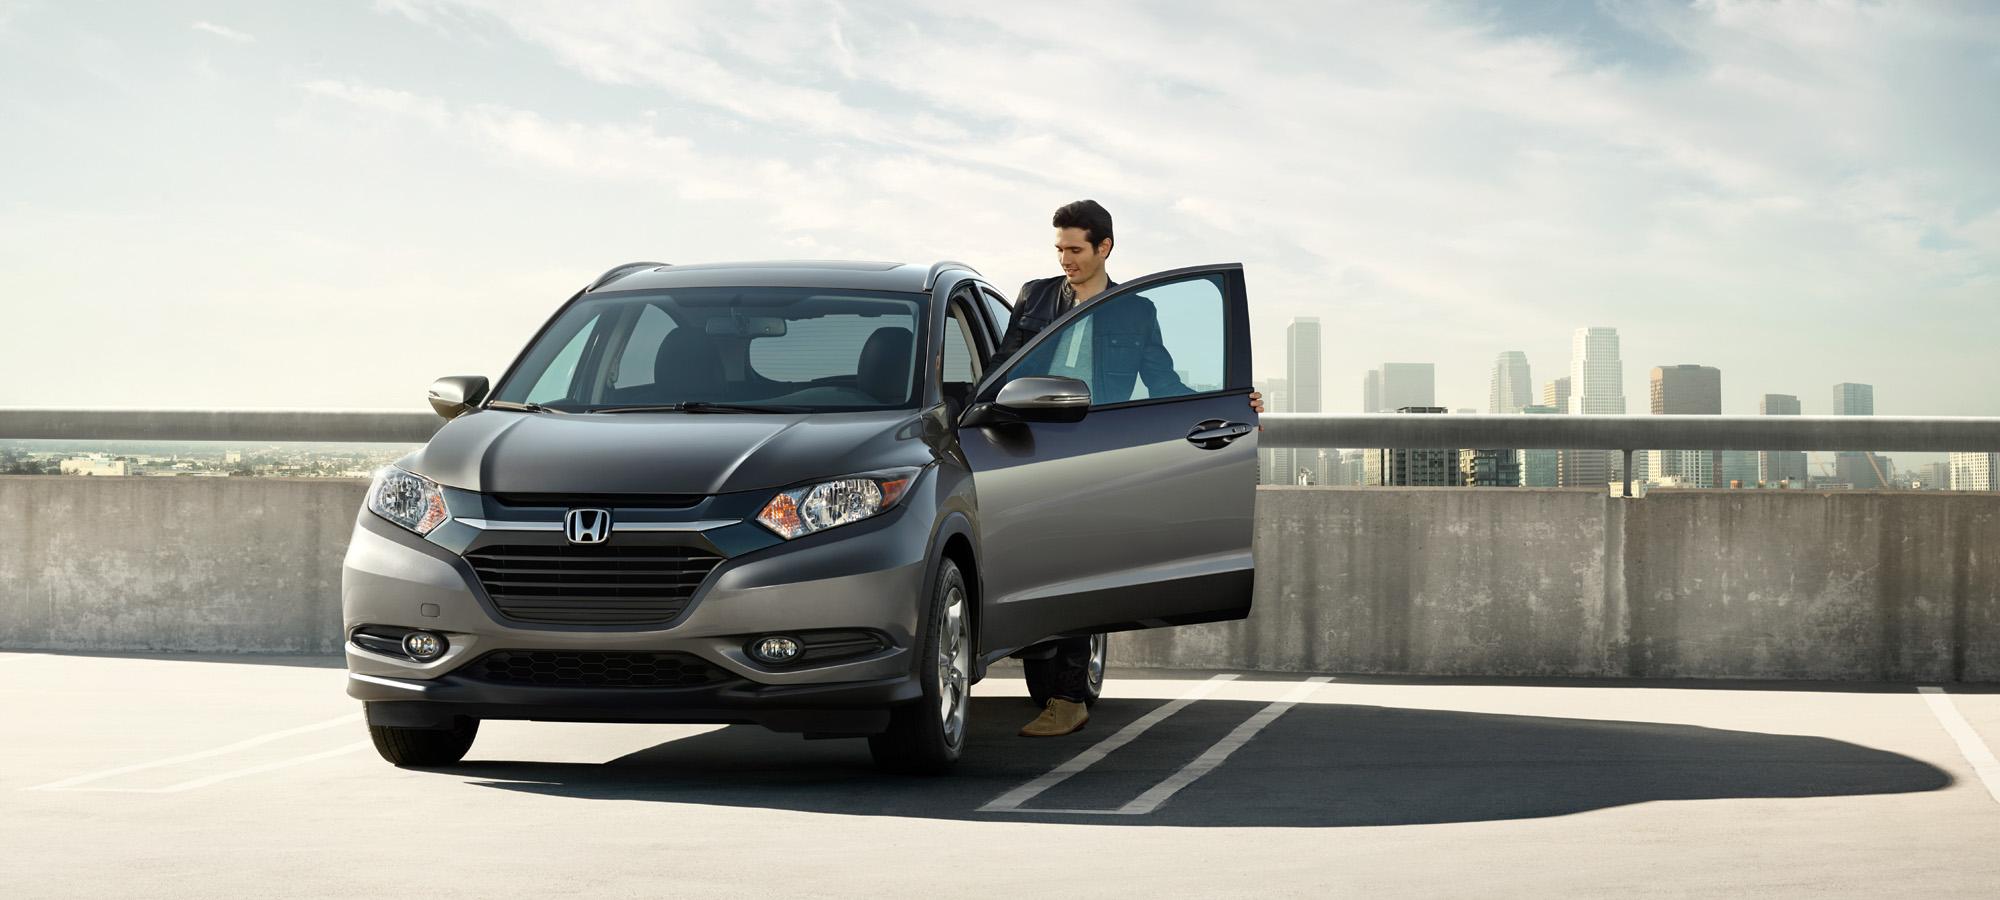 2016 Honda HR-V For Sale in Waukesha, WI